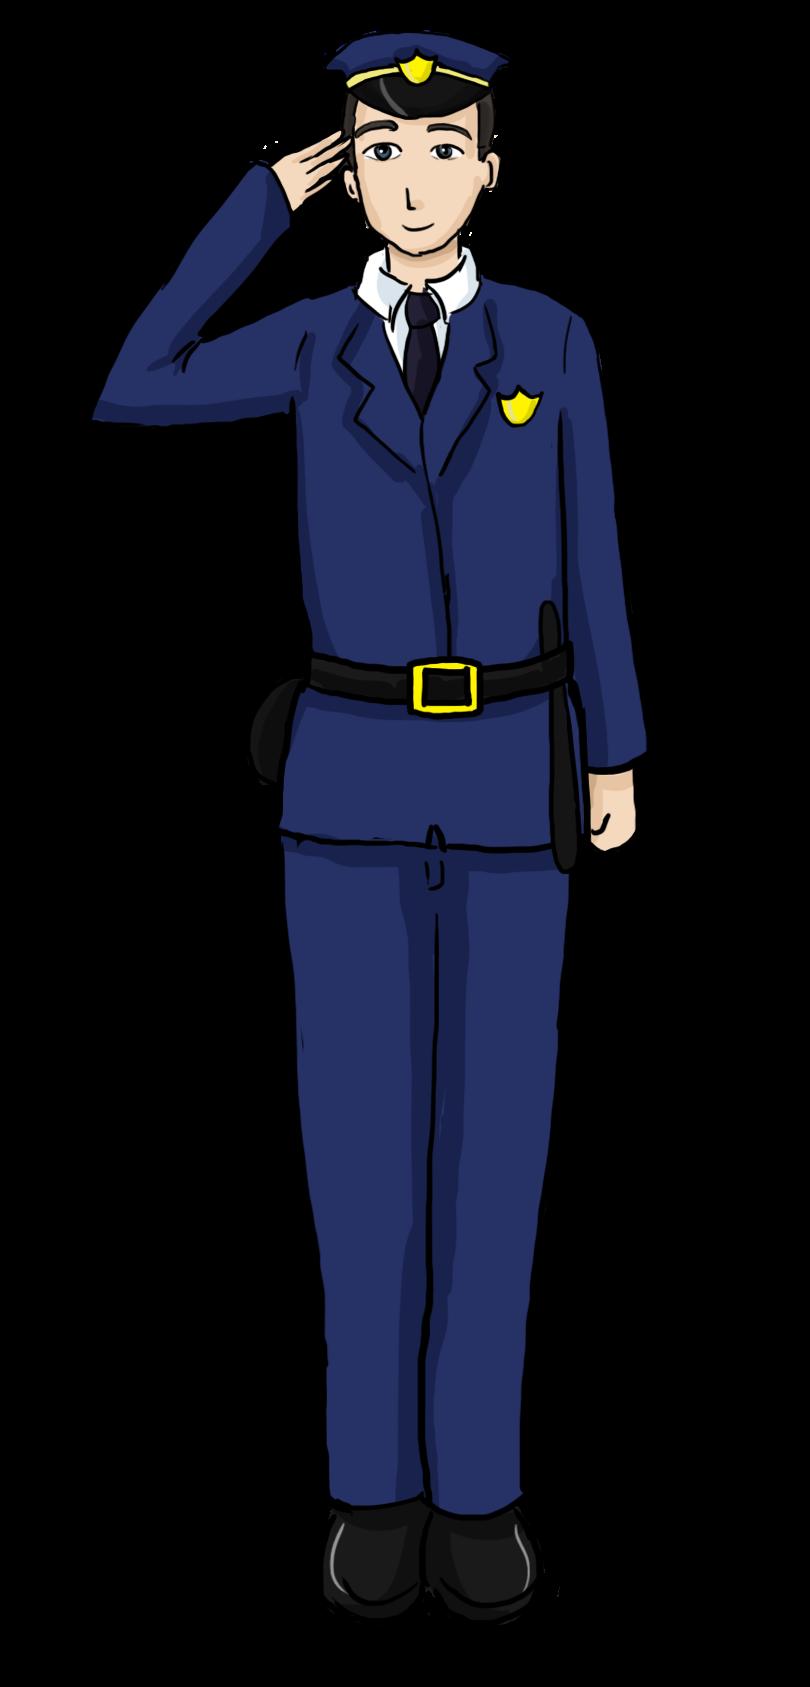 Free Policeman Clip Art